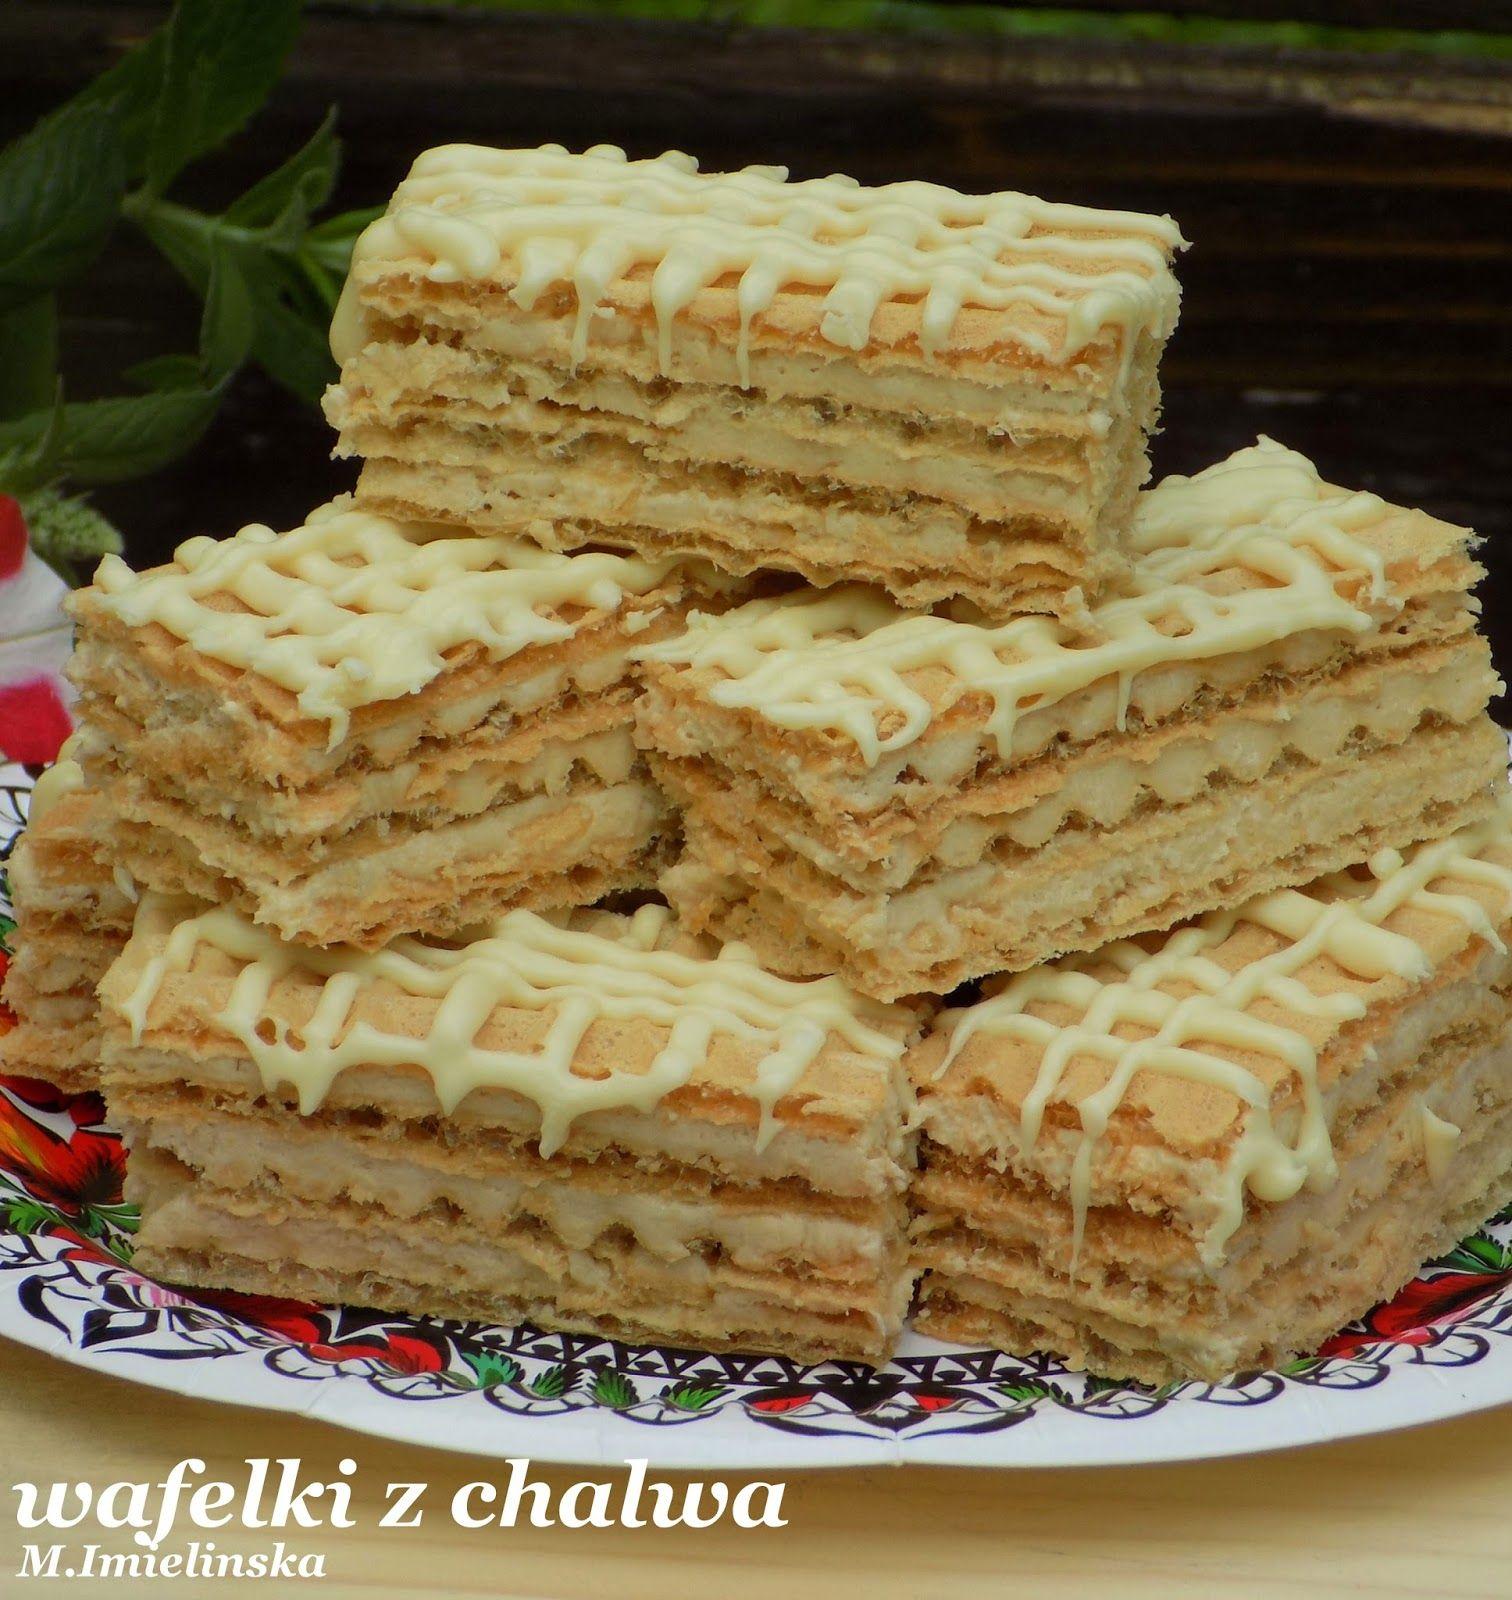 Domowa Cukierenka Domowa Kuchnia Wafelki Z Chalwa I Biala Czekolada Pumpkin Cheesecake Homemade Cakes Baking